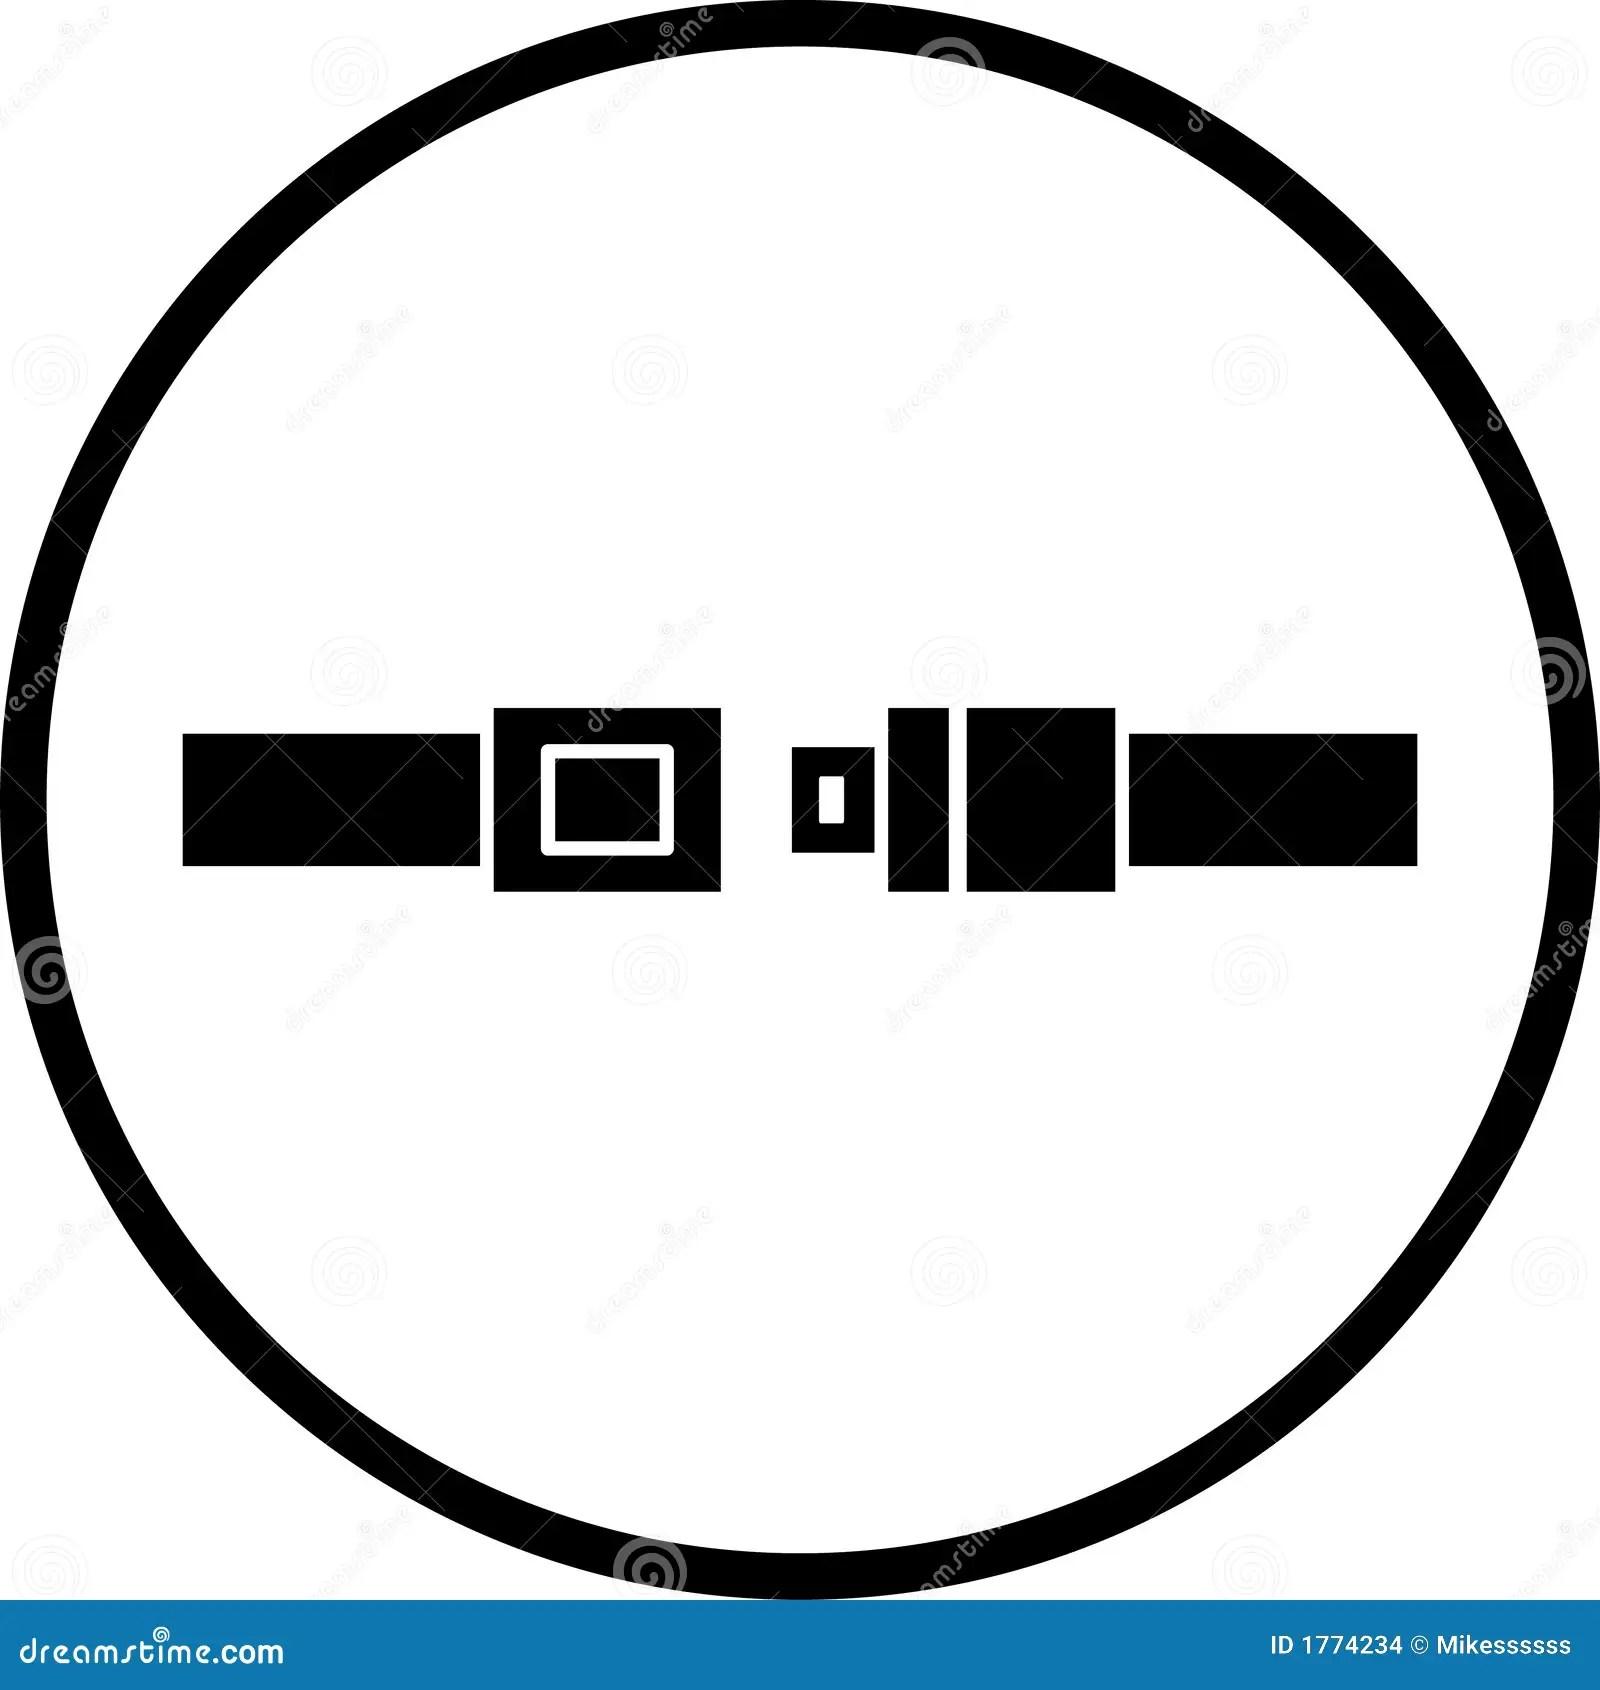 Seat Belt Vector Symbol Stock Images